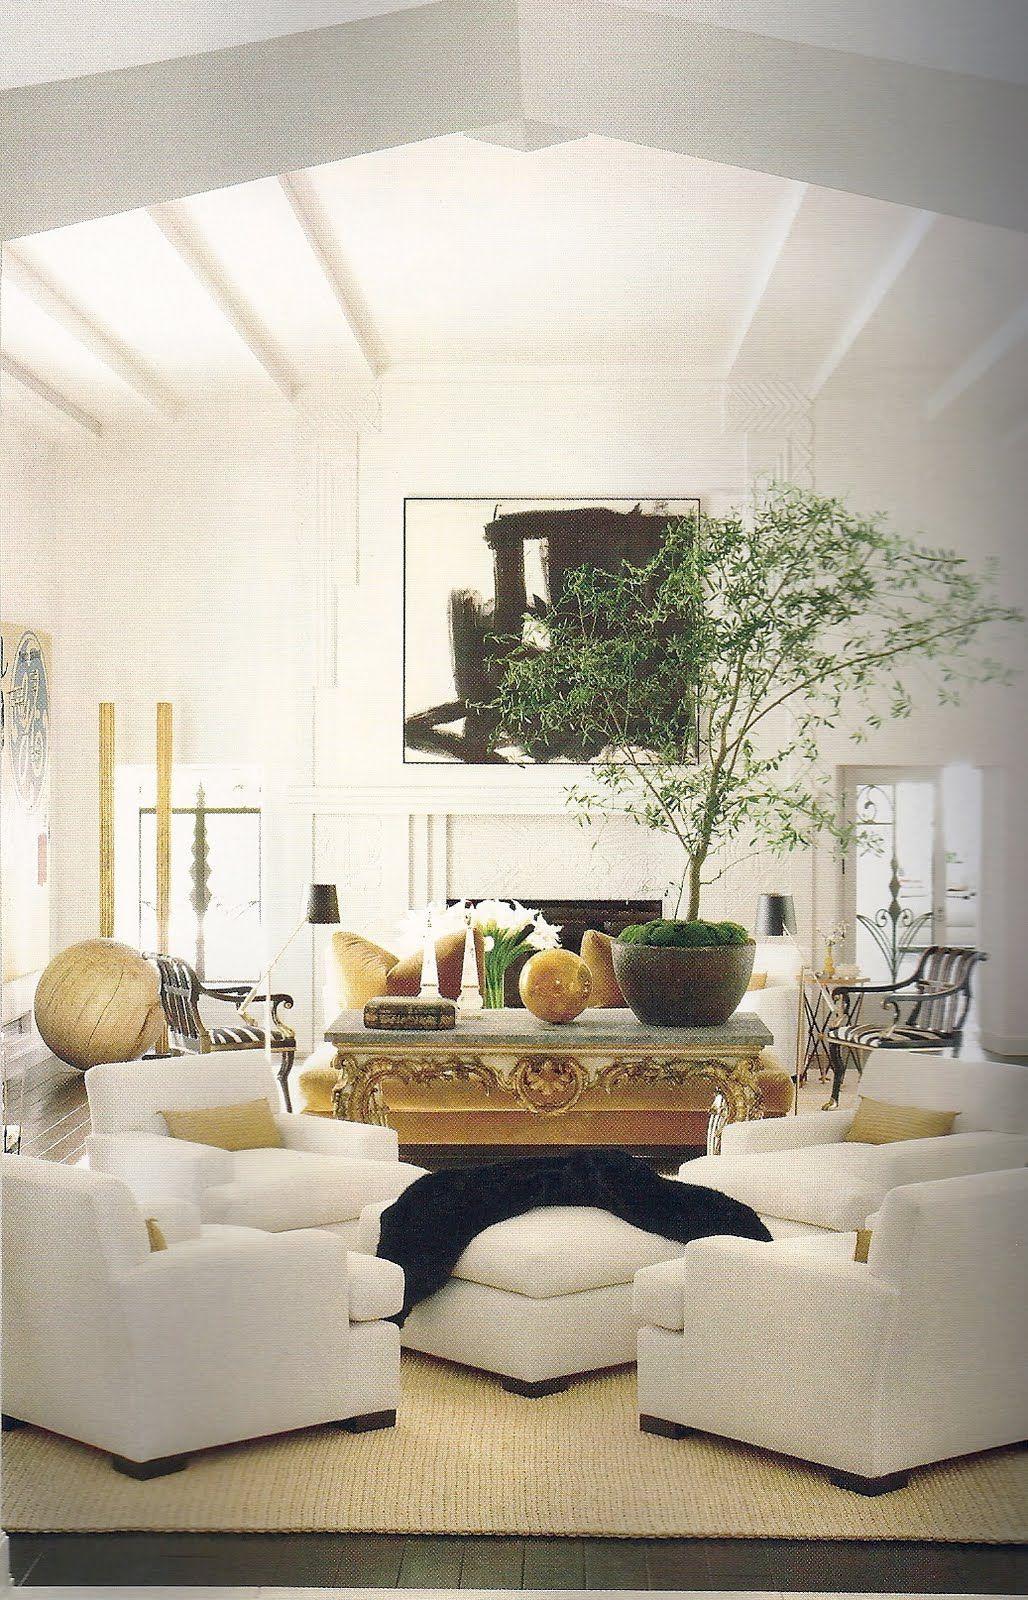 Sitting Room Designs Furniture: Furniture Arrangements - Four Chairs